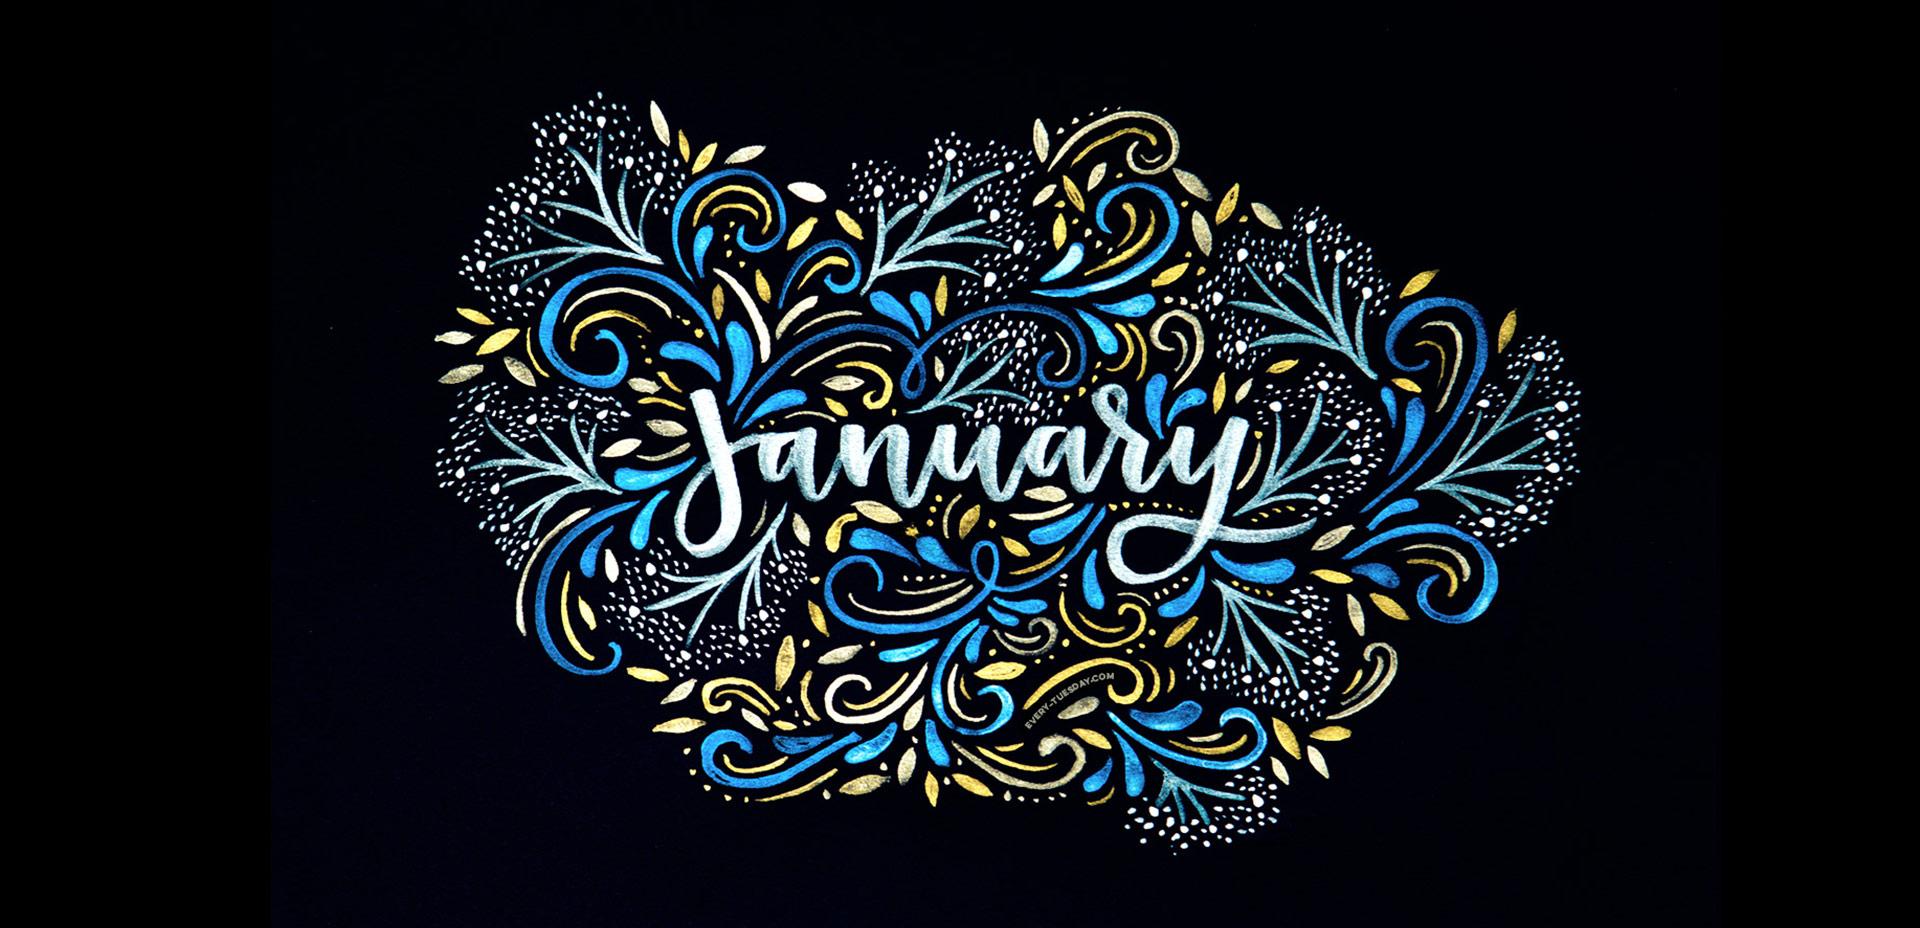 Freebie January 2017 Desktop Wallpapers   Every Tuesday 1920x928